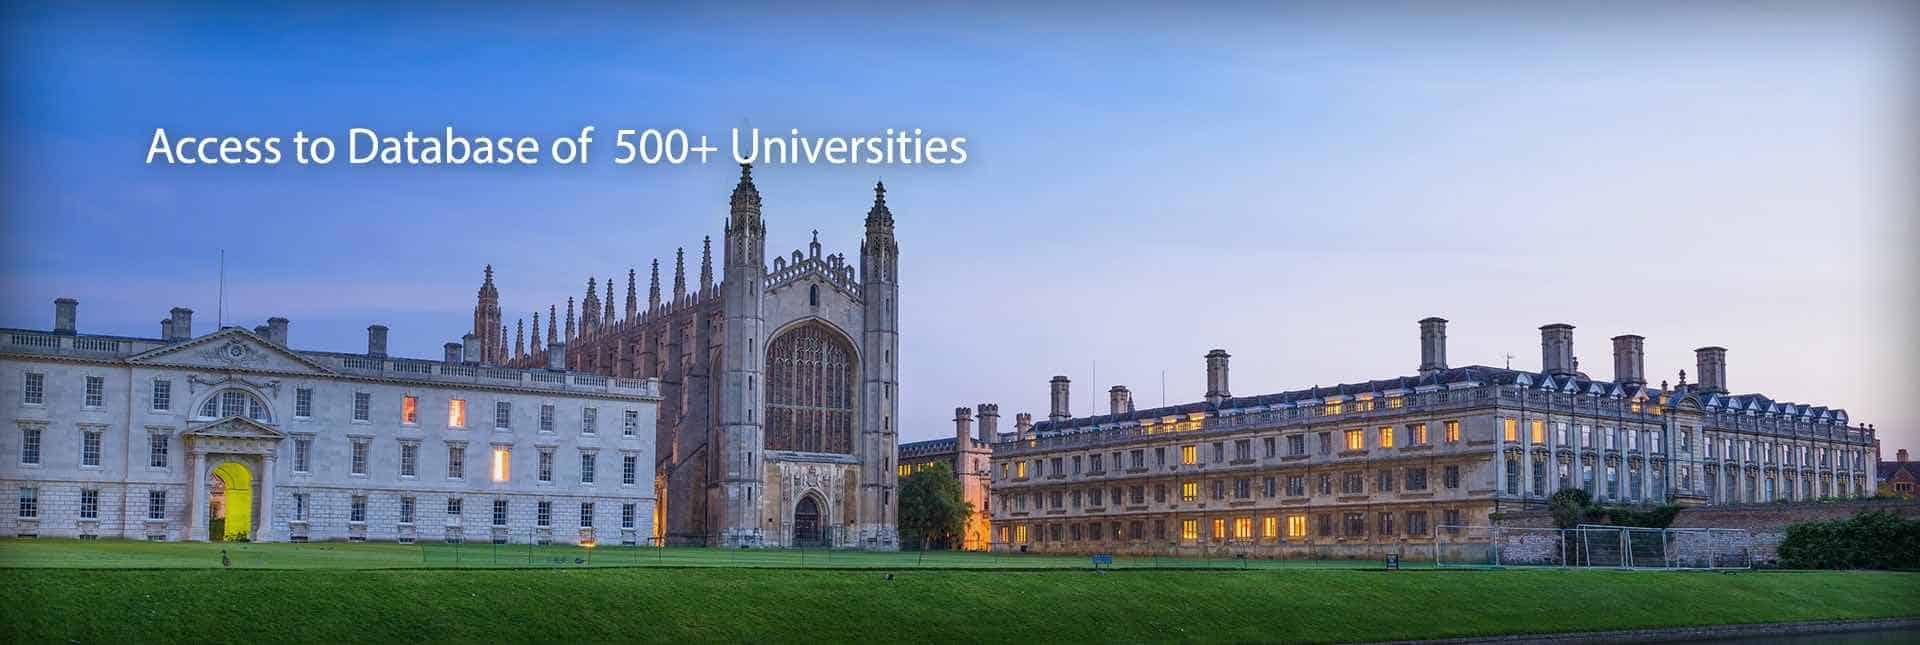 study abroad - slider image